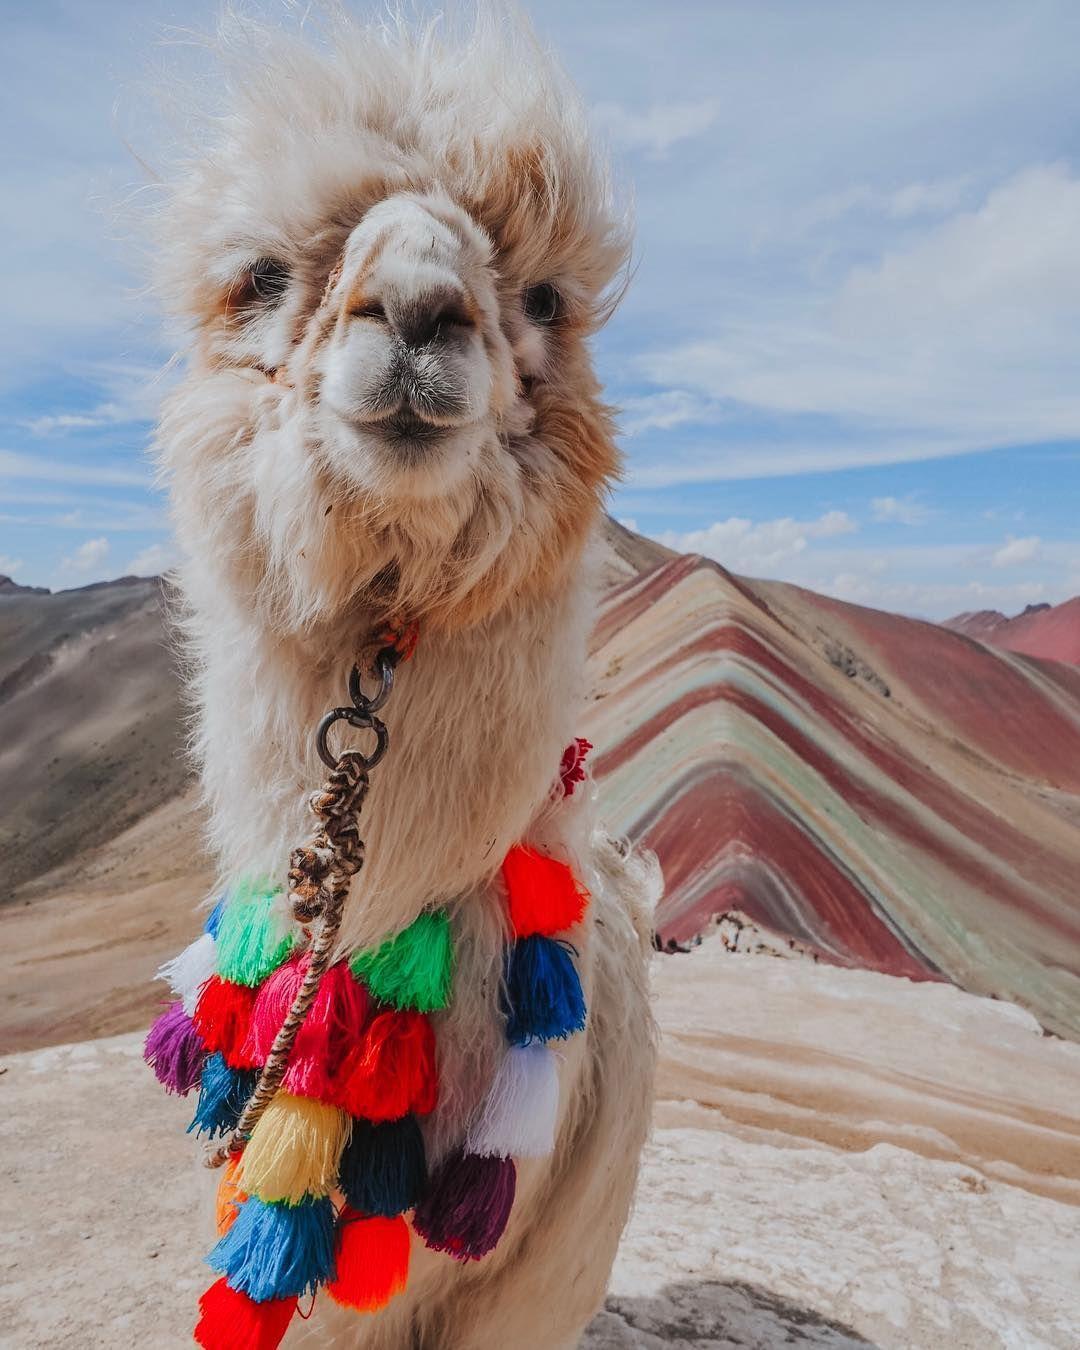 Llama Baby Hilarious Cute Vibe Adorable Sweet Animals